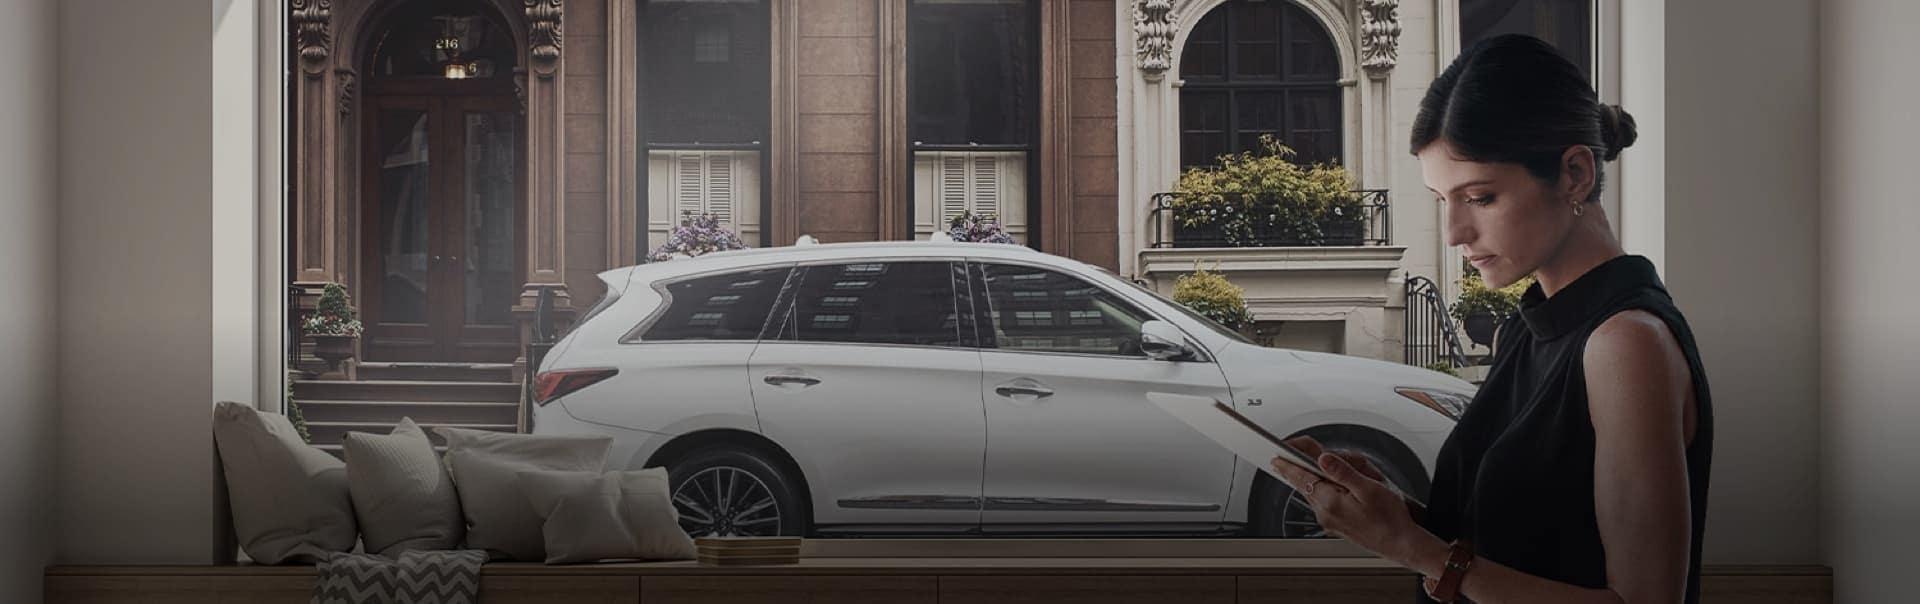 Women standing by window next to white luxury car